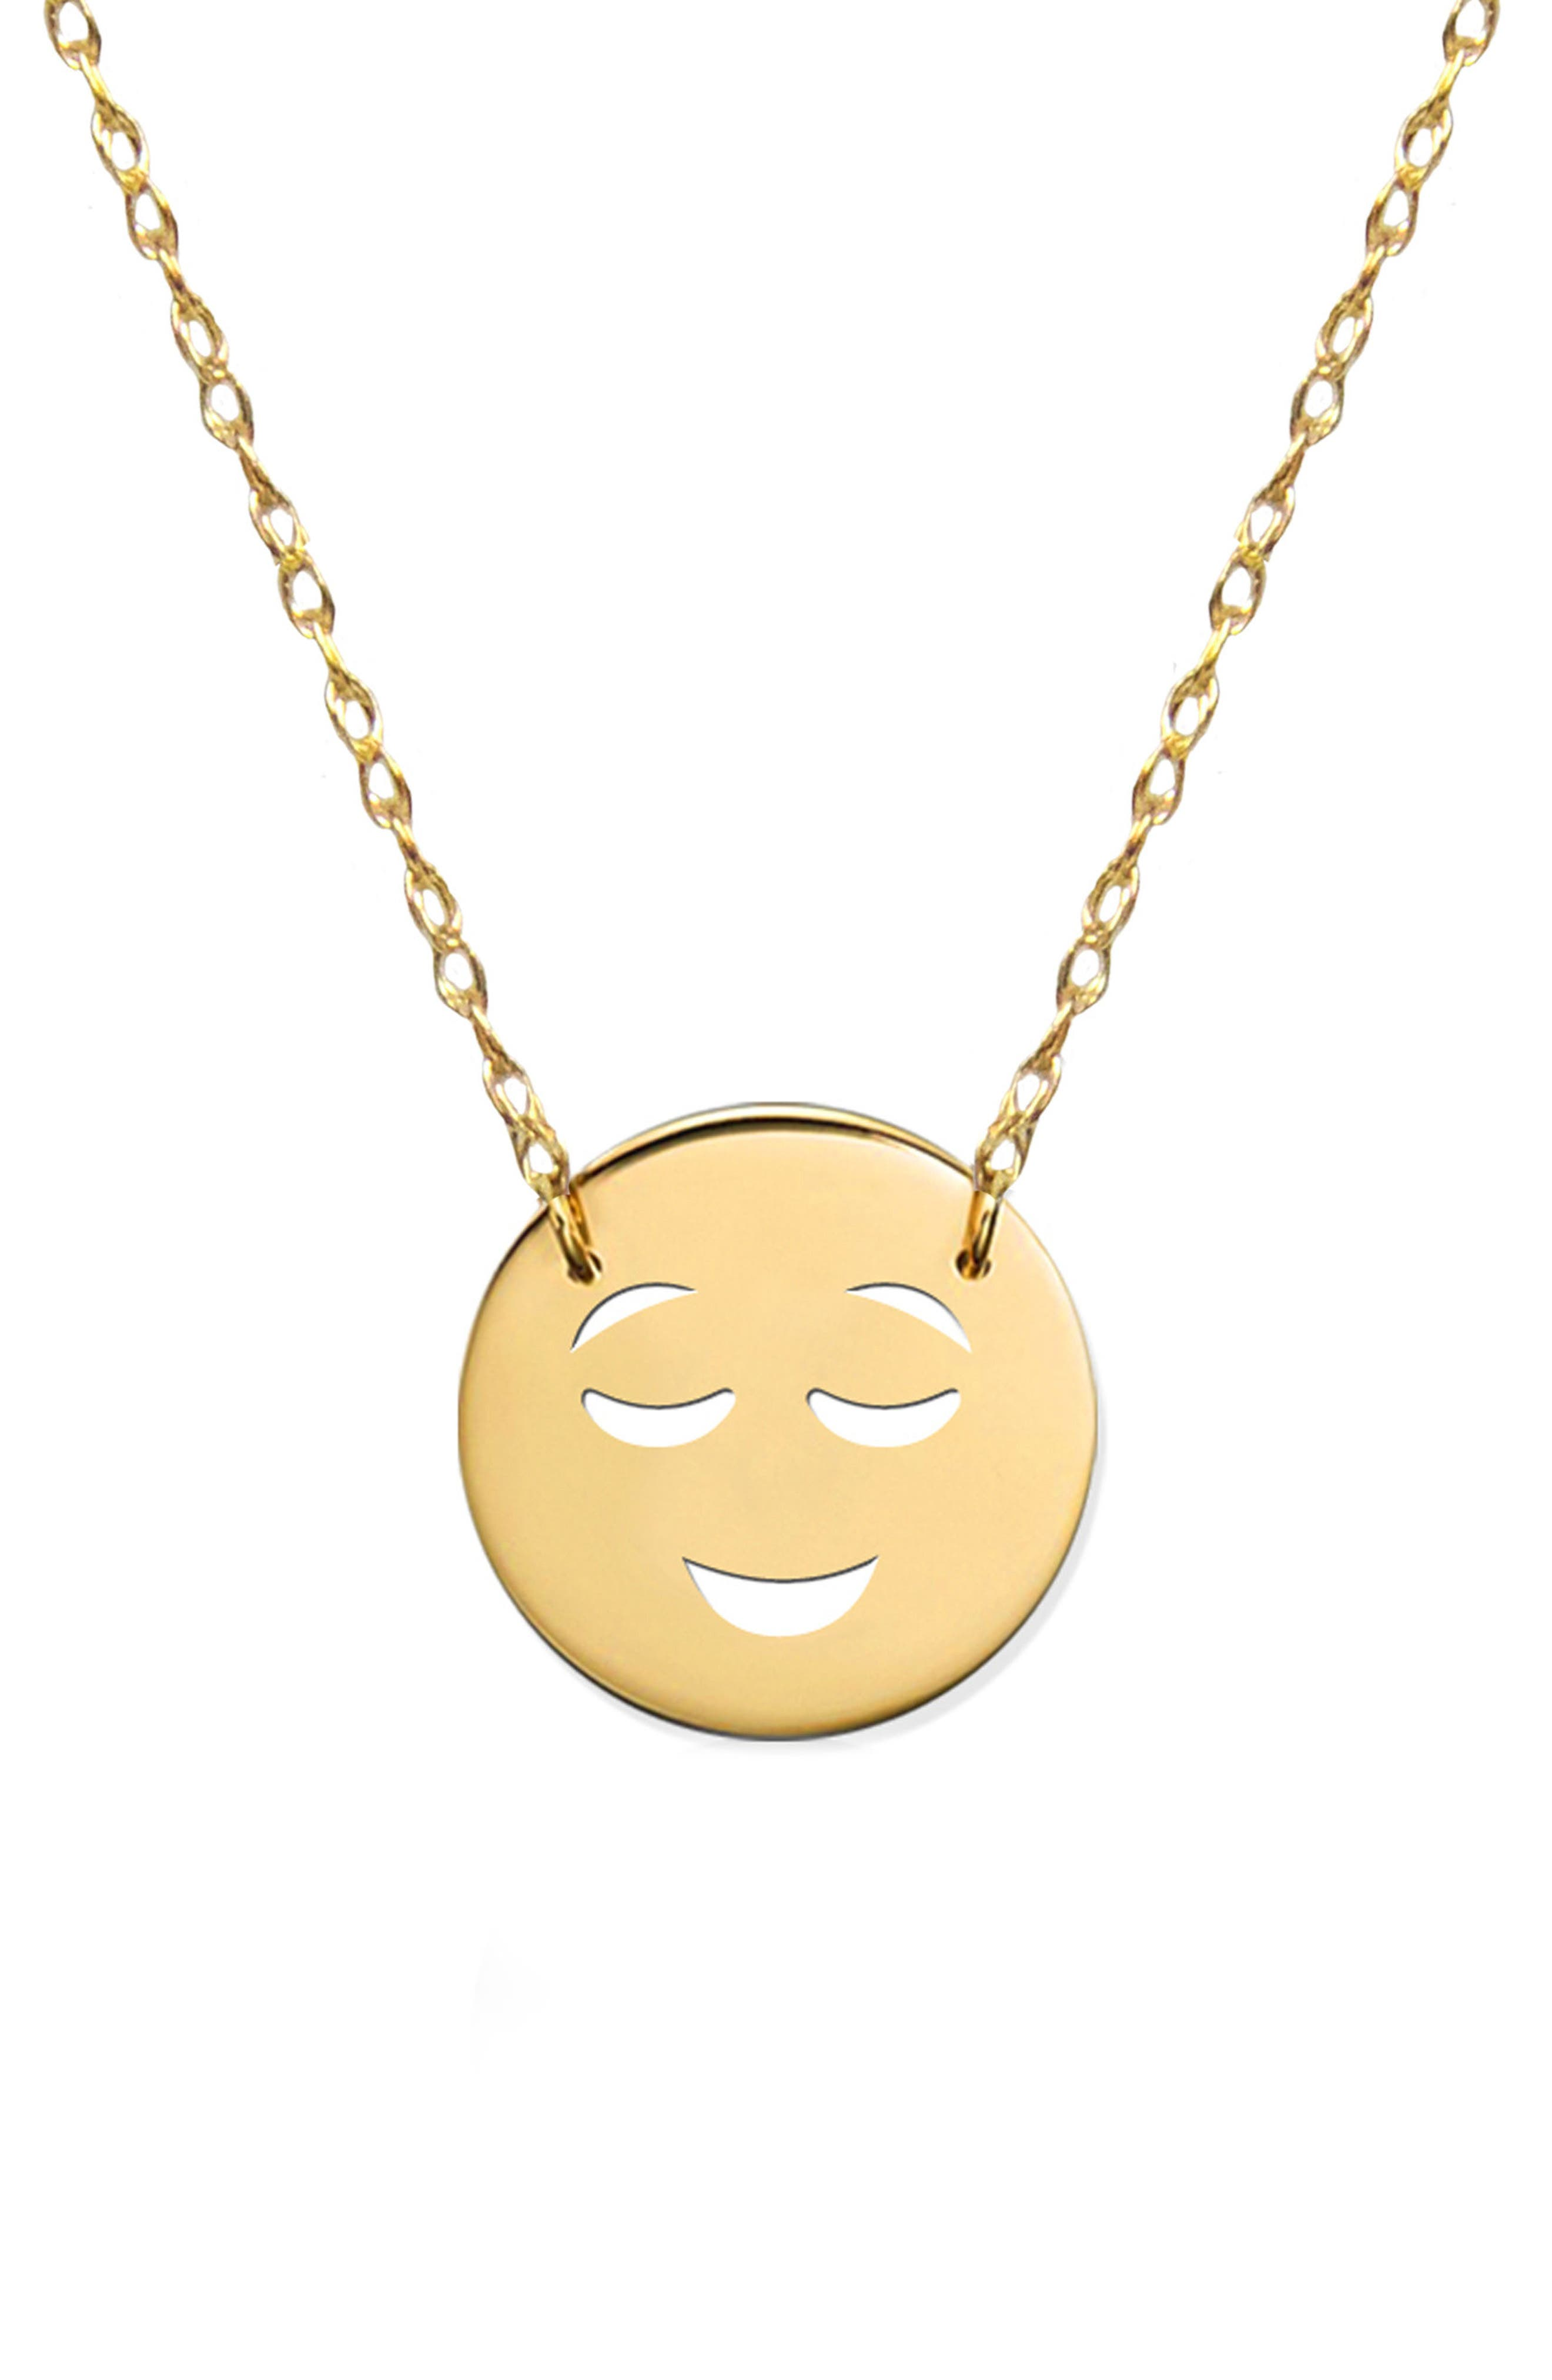 Alternate Image 1 Selected - Jane Basch Designs Happy Emoji Pendant Necklace (Nordstrom Exclusive)